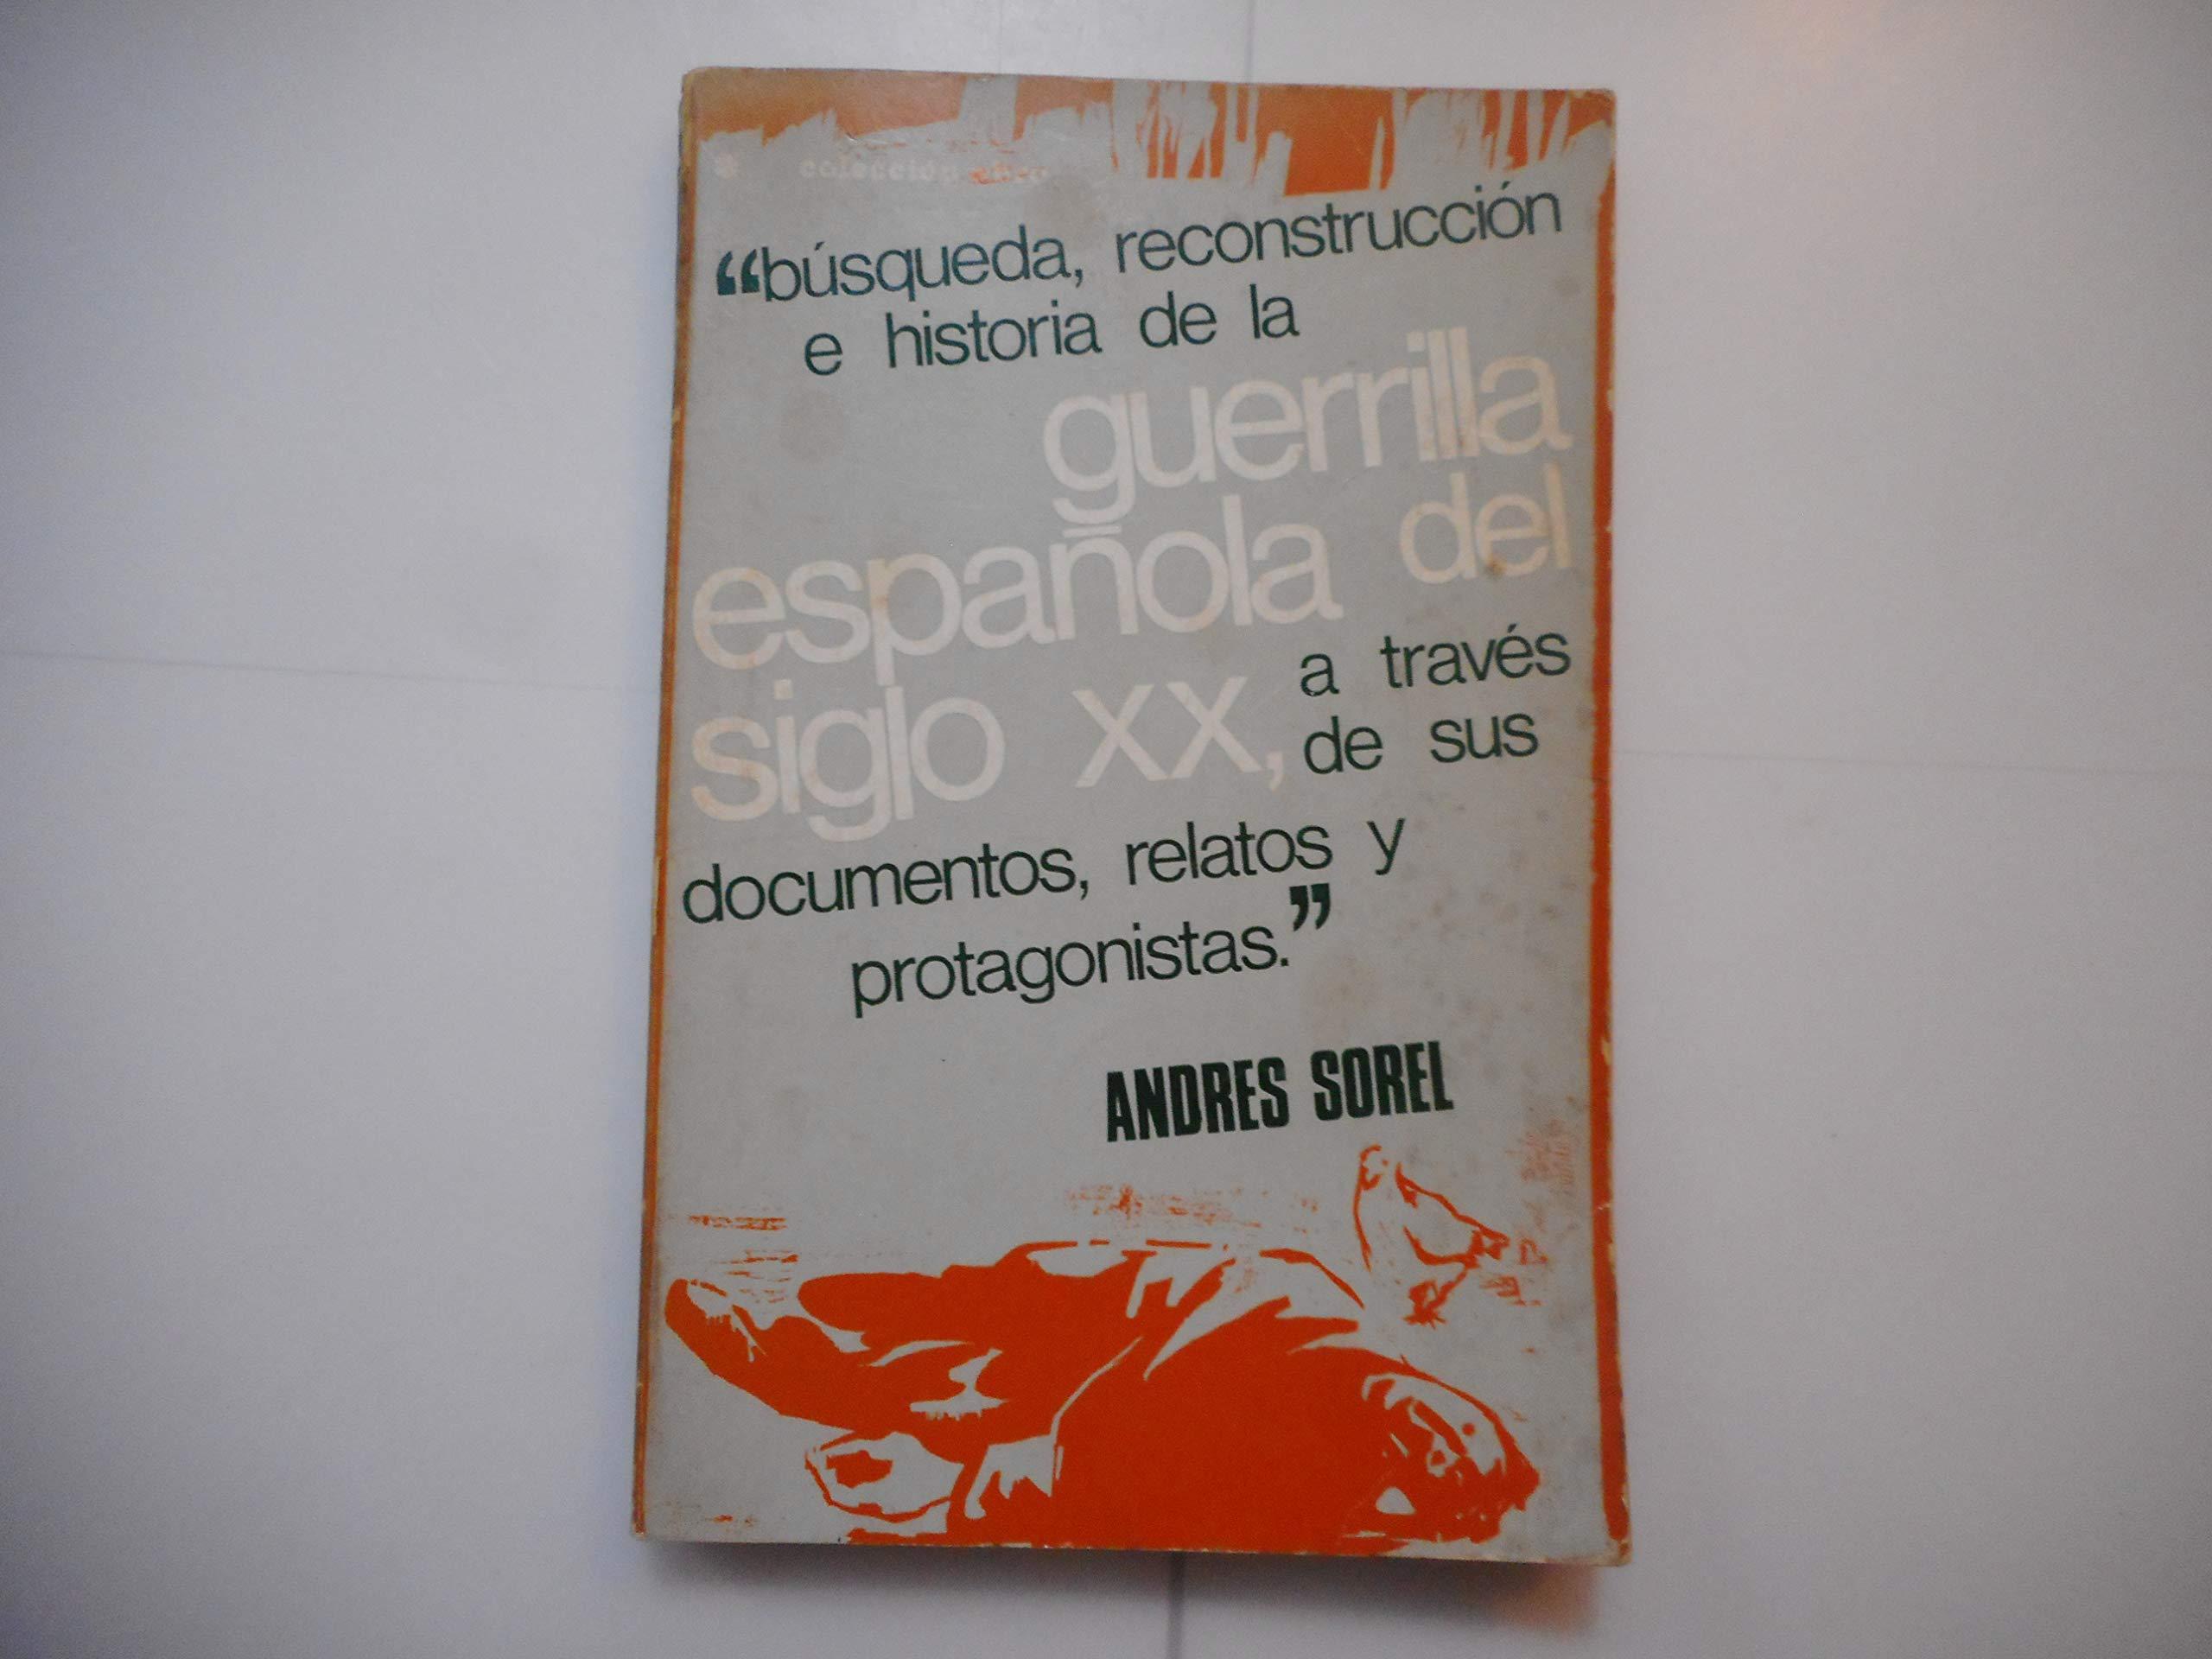 GUERRILLA ESPAÑOLA DEL SIGLO XX, Busqueda, reconstruccion e historia a traves de documentos, relatos...: Amazon.es: Andrés Sorel, Ebro: Libros